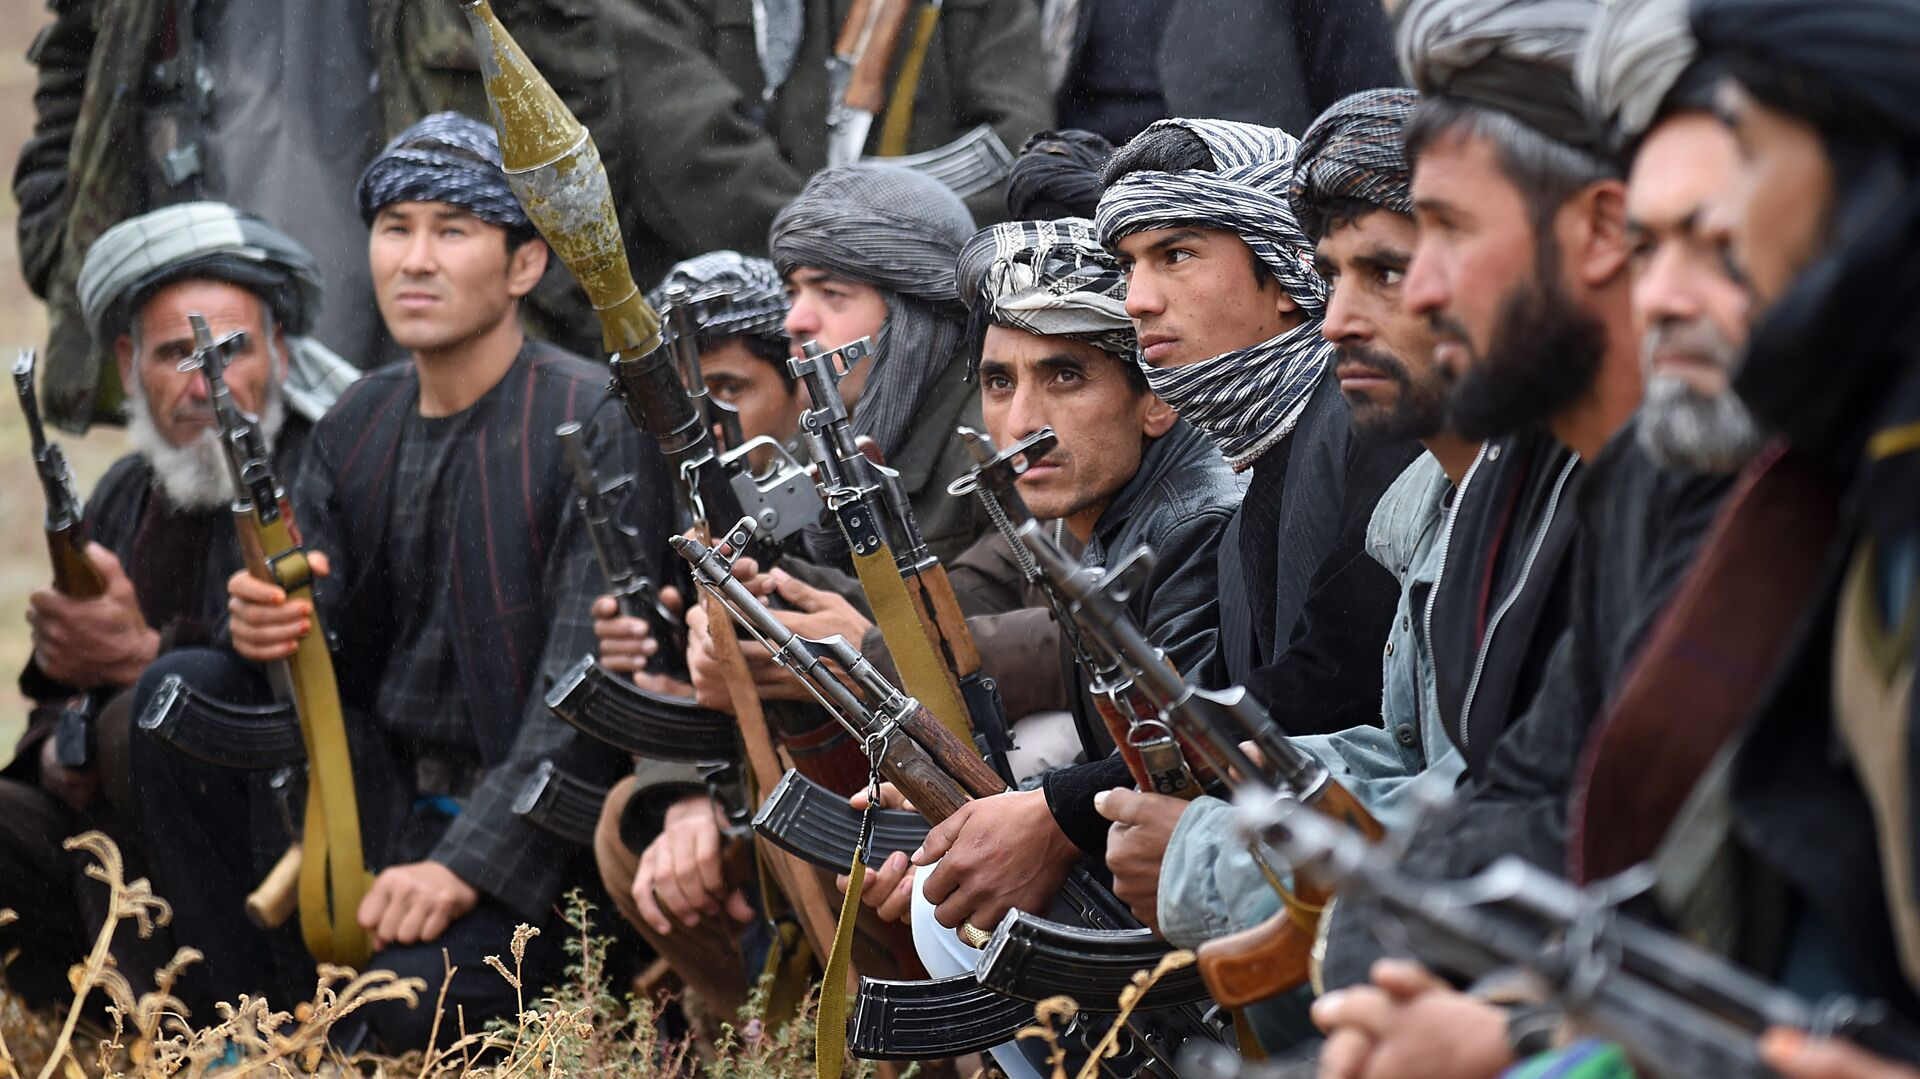 Боевики движения Талибан - Sputnik Latvija, 1920, 22.04.2021